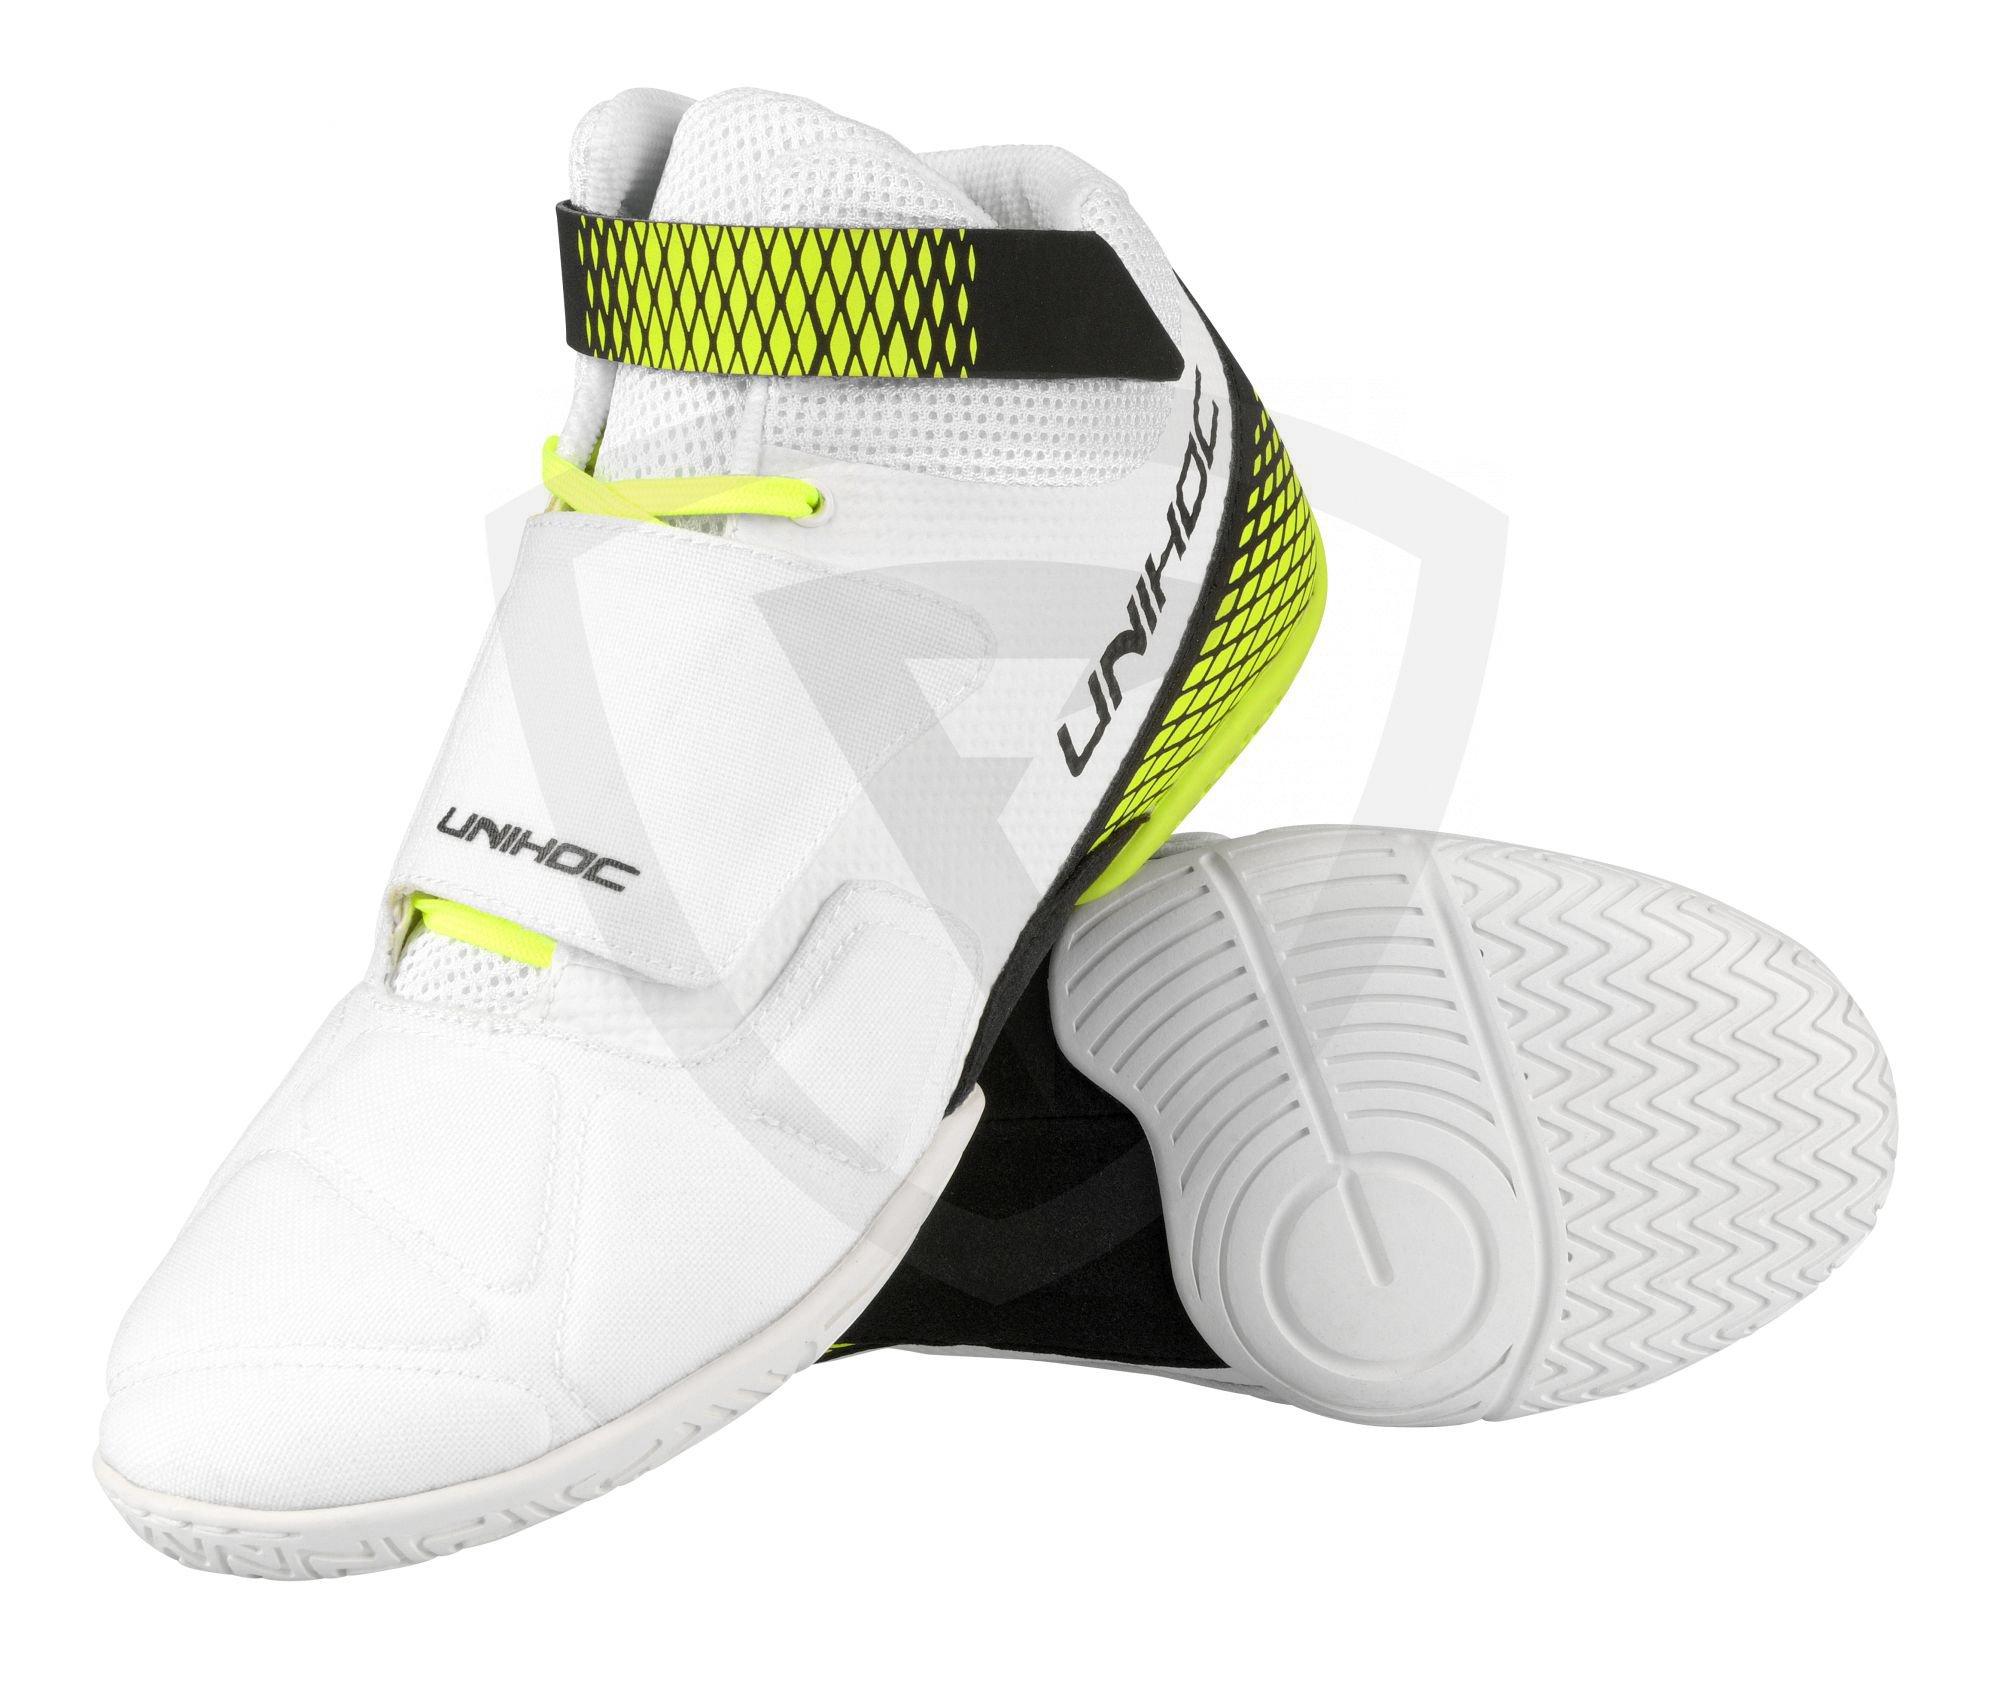 Unihoc U4 Goalie White Neon Yellow brankářská obuv - Florbal.com 41e8c2330b